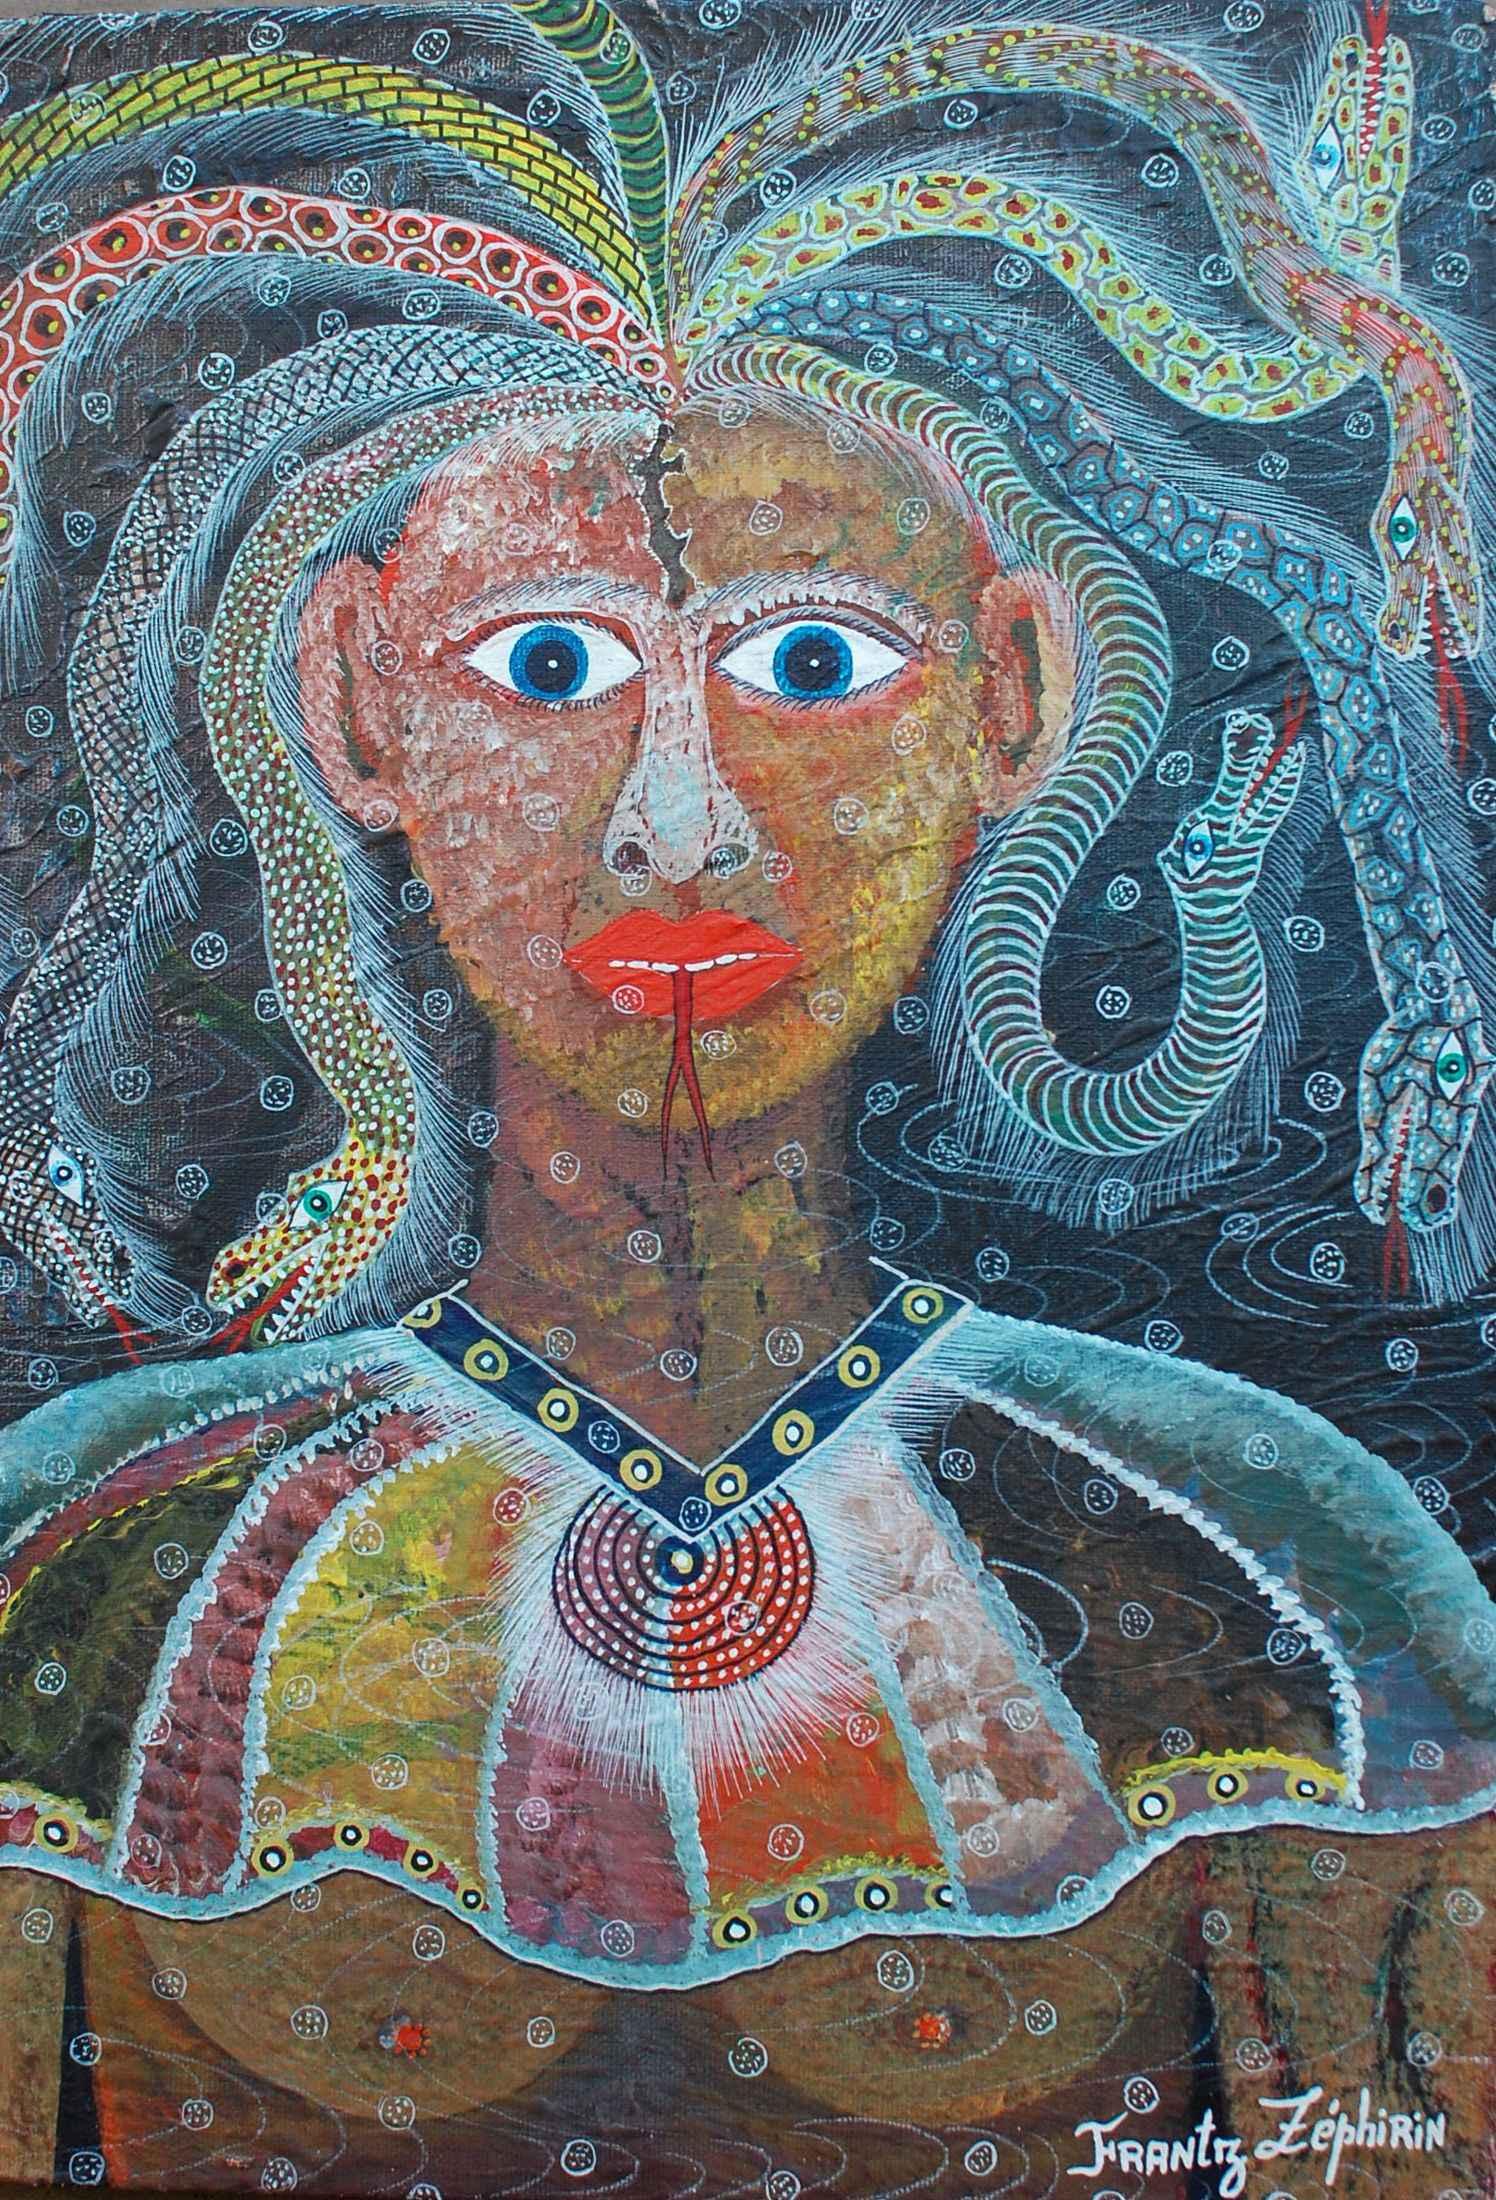 Snake Charmer by  Frantz ZEPHIRIN - Masterpiece Online